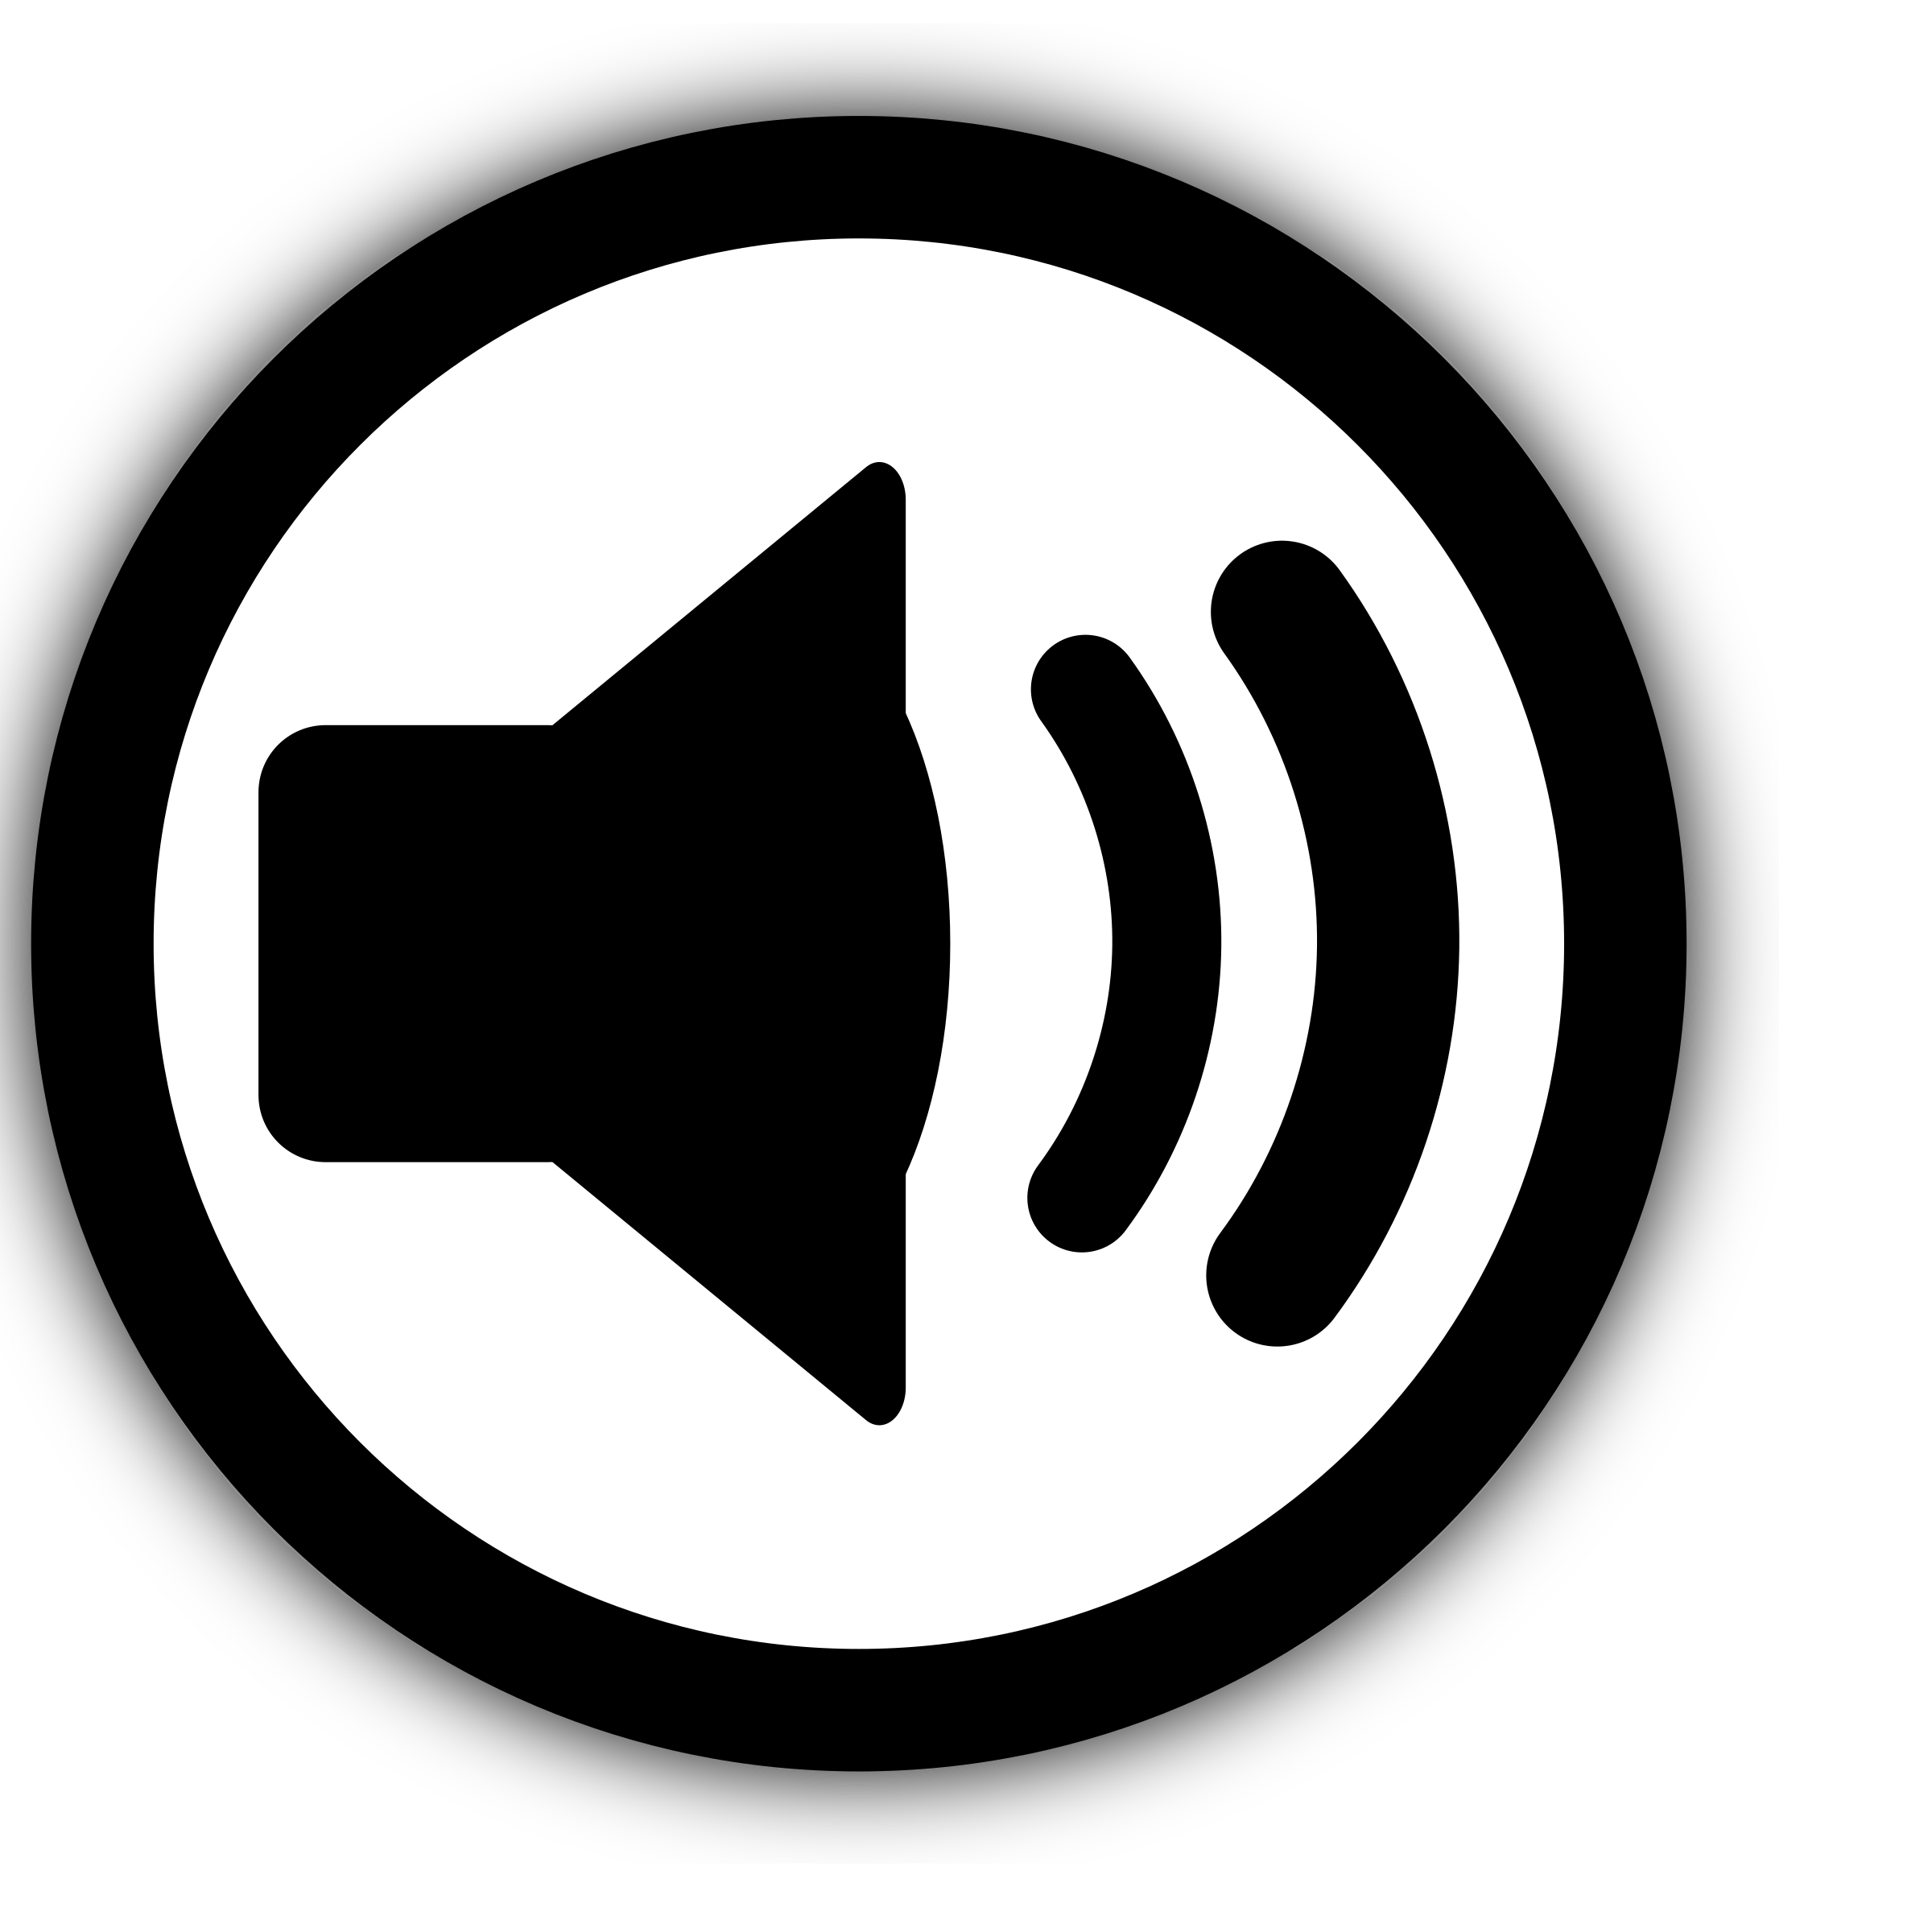 Free Microsoft Cliparts Audio, Download Free Clip Art, Free.